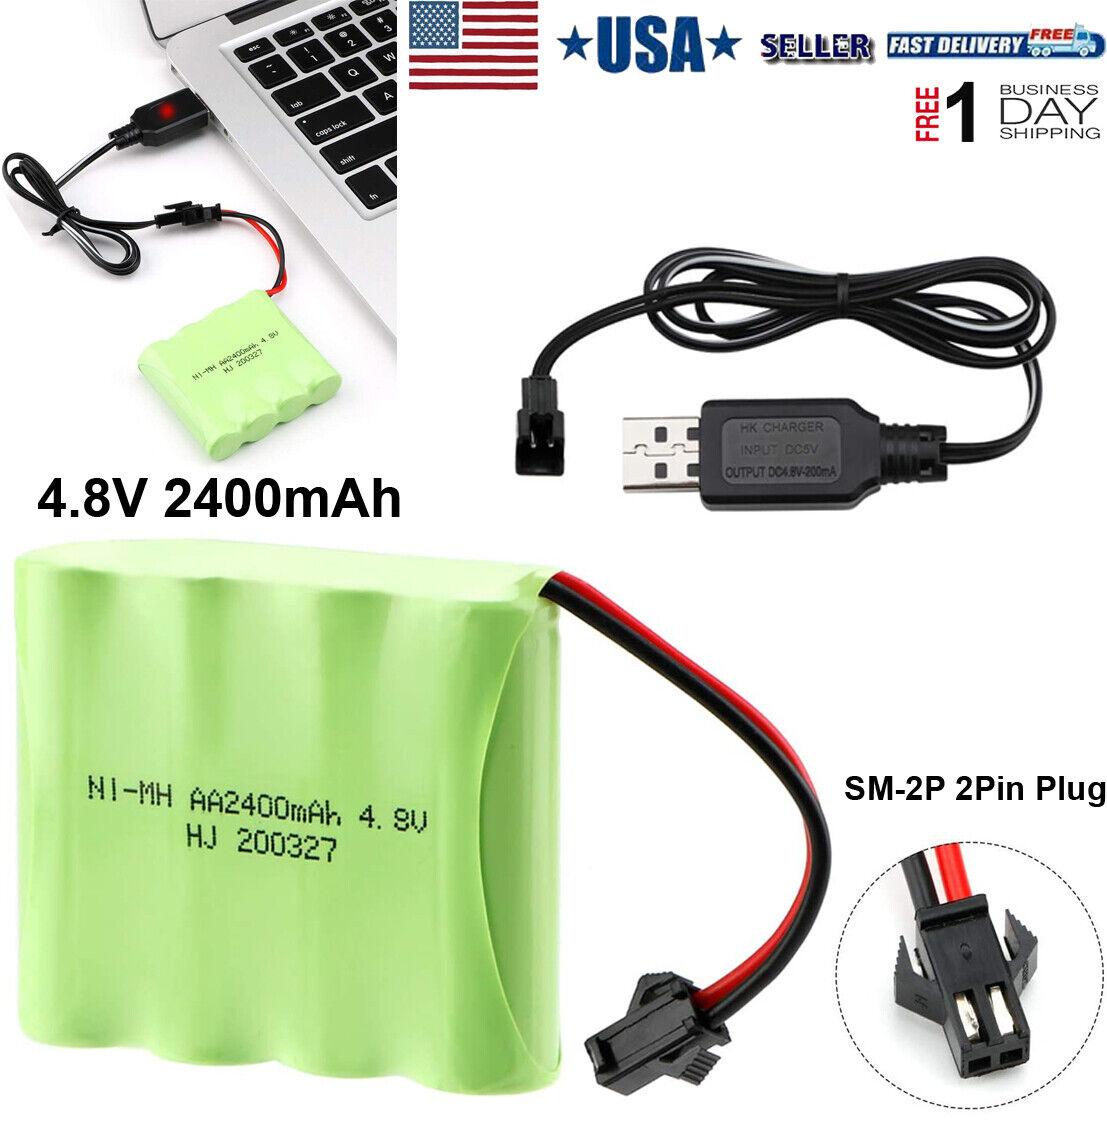 Charging Cable USB Battery Charger Ni-Cd Ni-MH Batteries Pack SM-2P Plug Adap W4